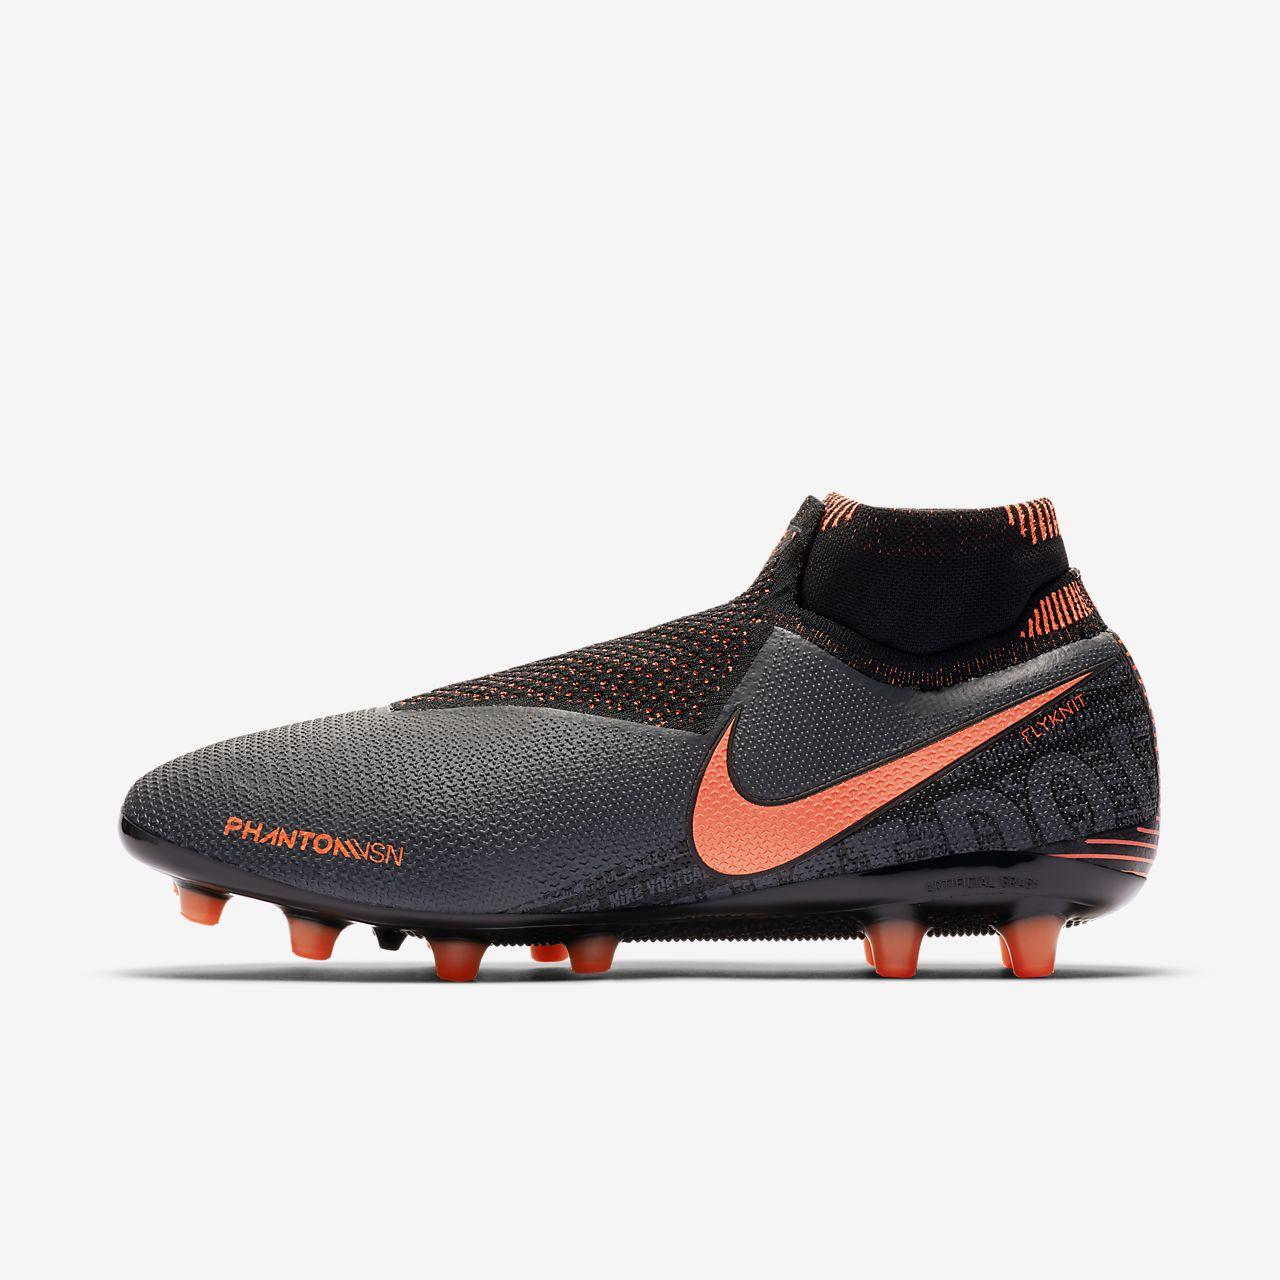 Nike Phantom Vision Elite Dynamic Fit Fußballschuh für Kunstrasen